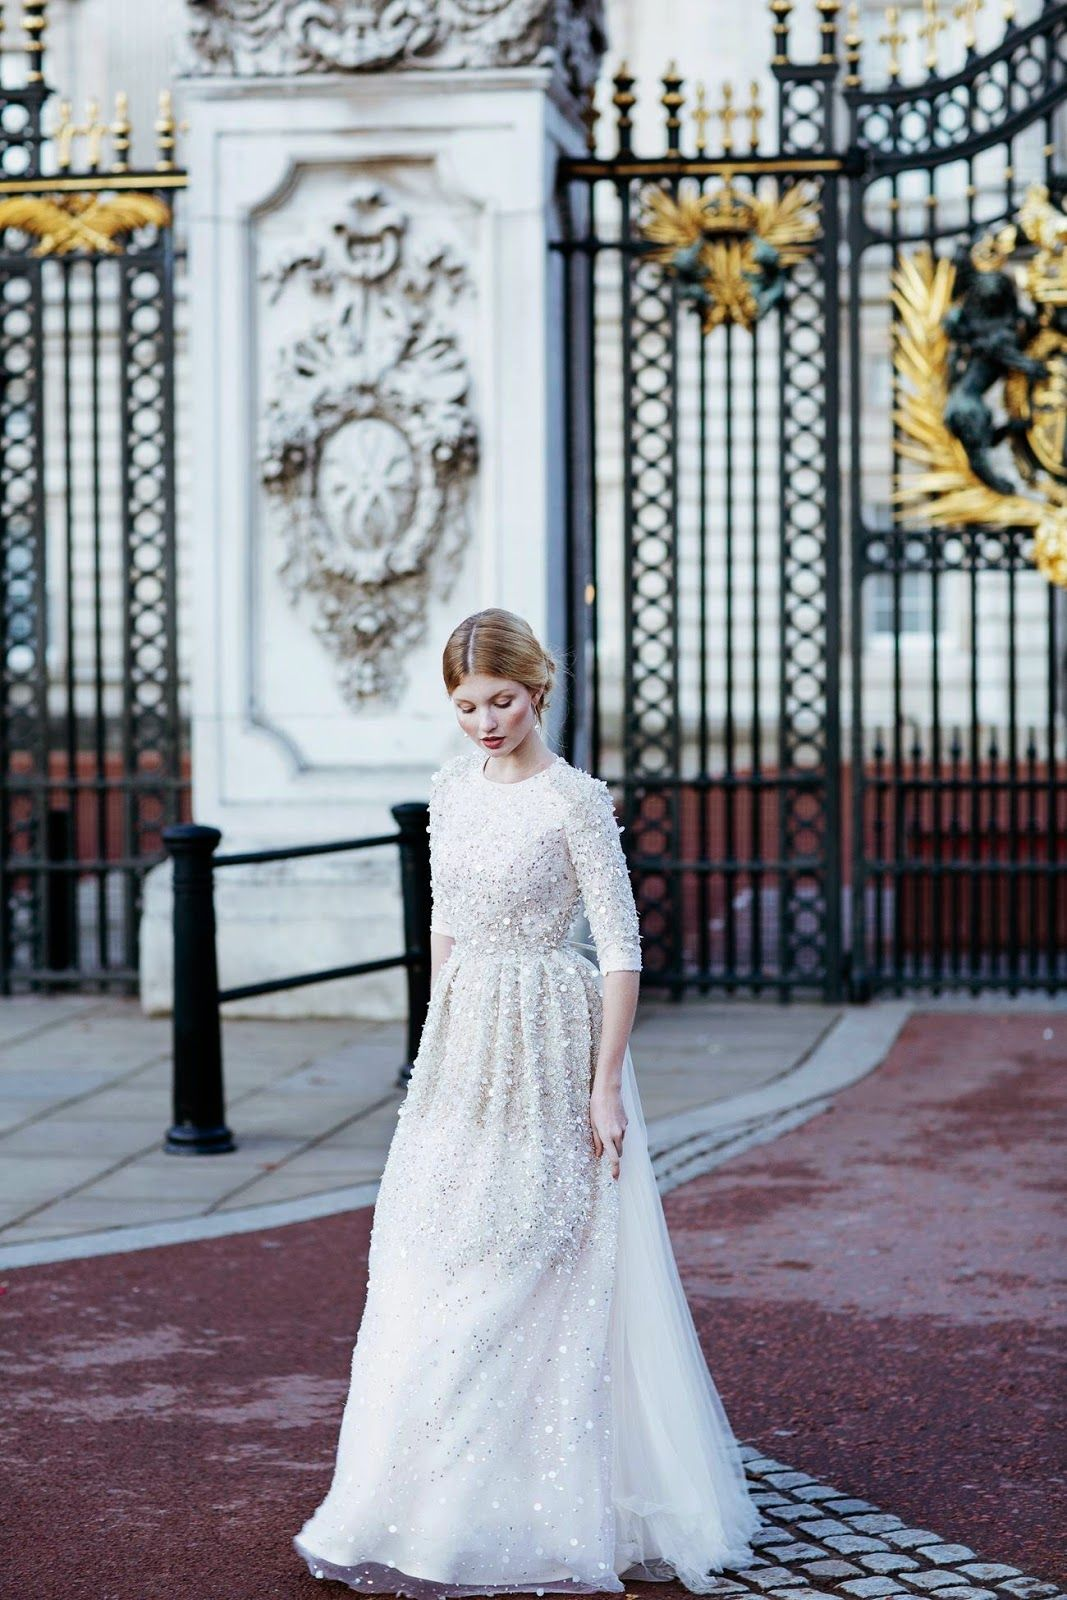 Großzügig Vestidos Novia Madrid Baratos Bilder - Brautkleider Ideen ...